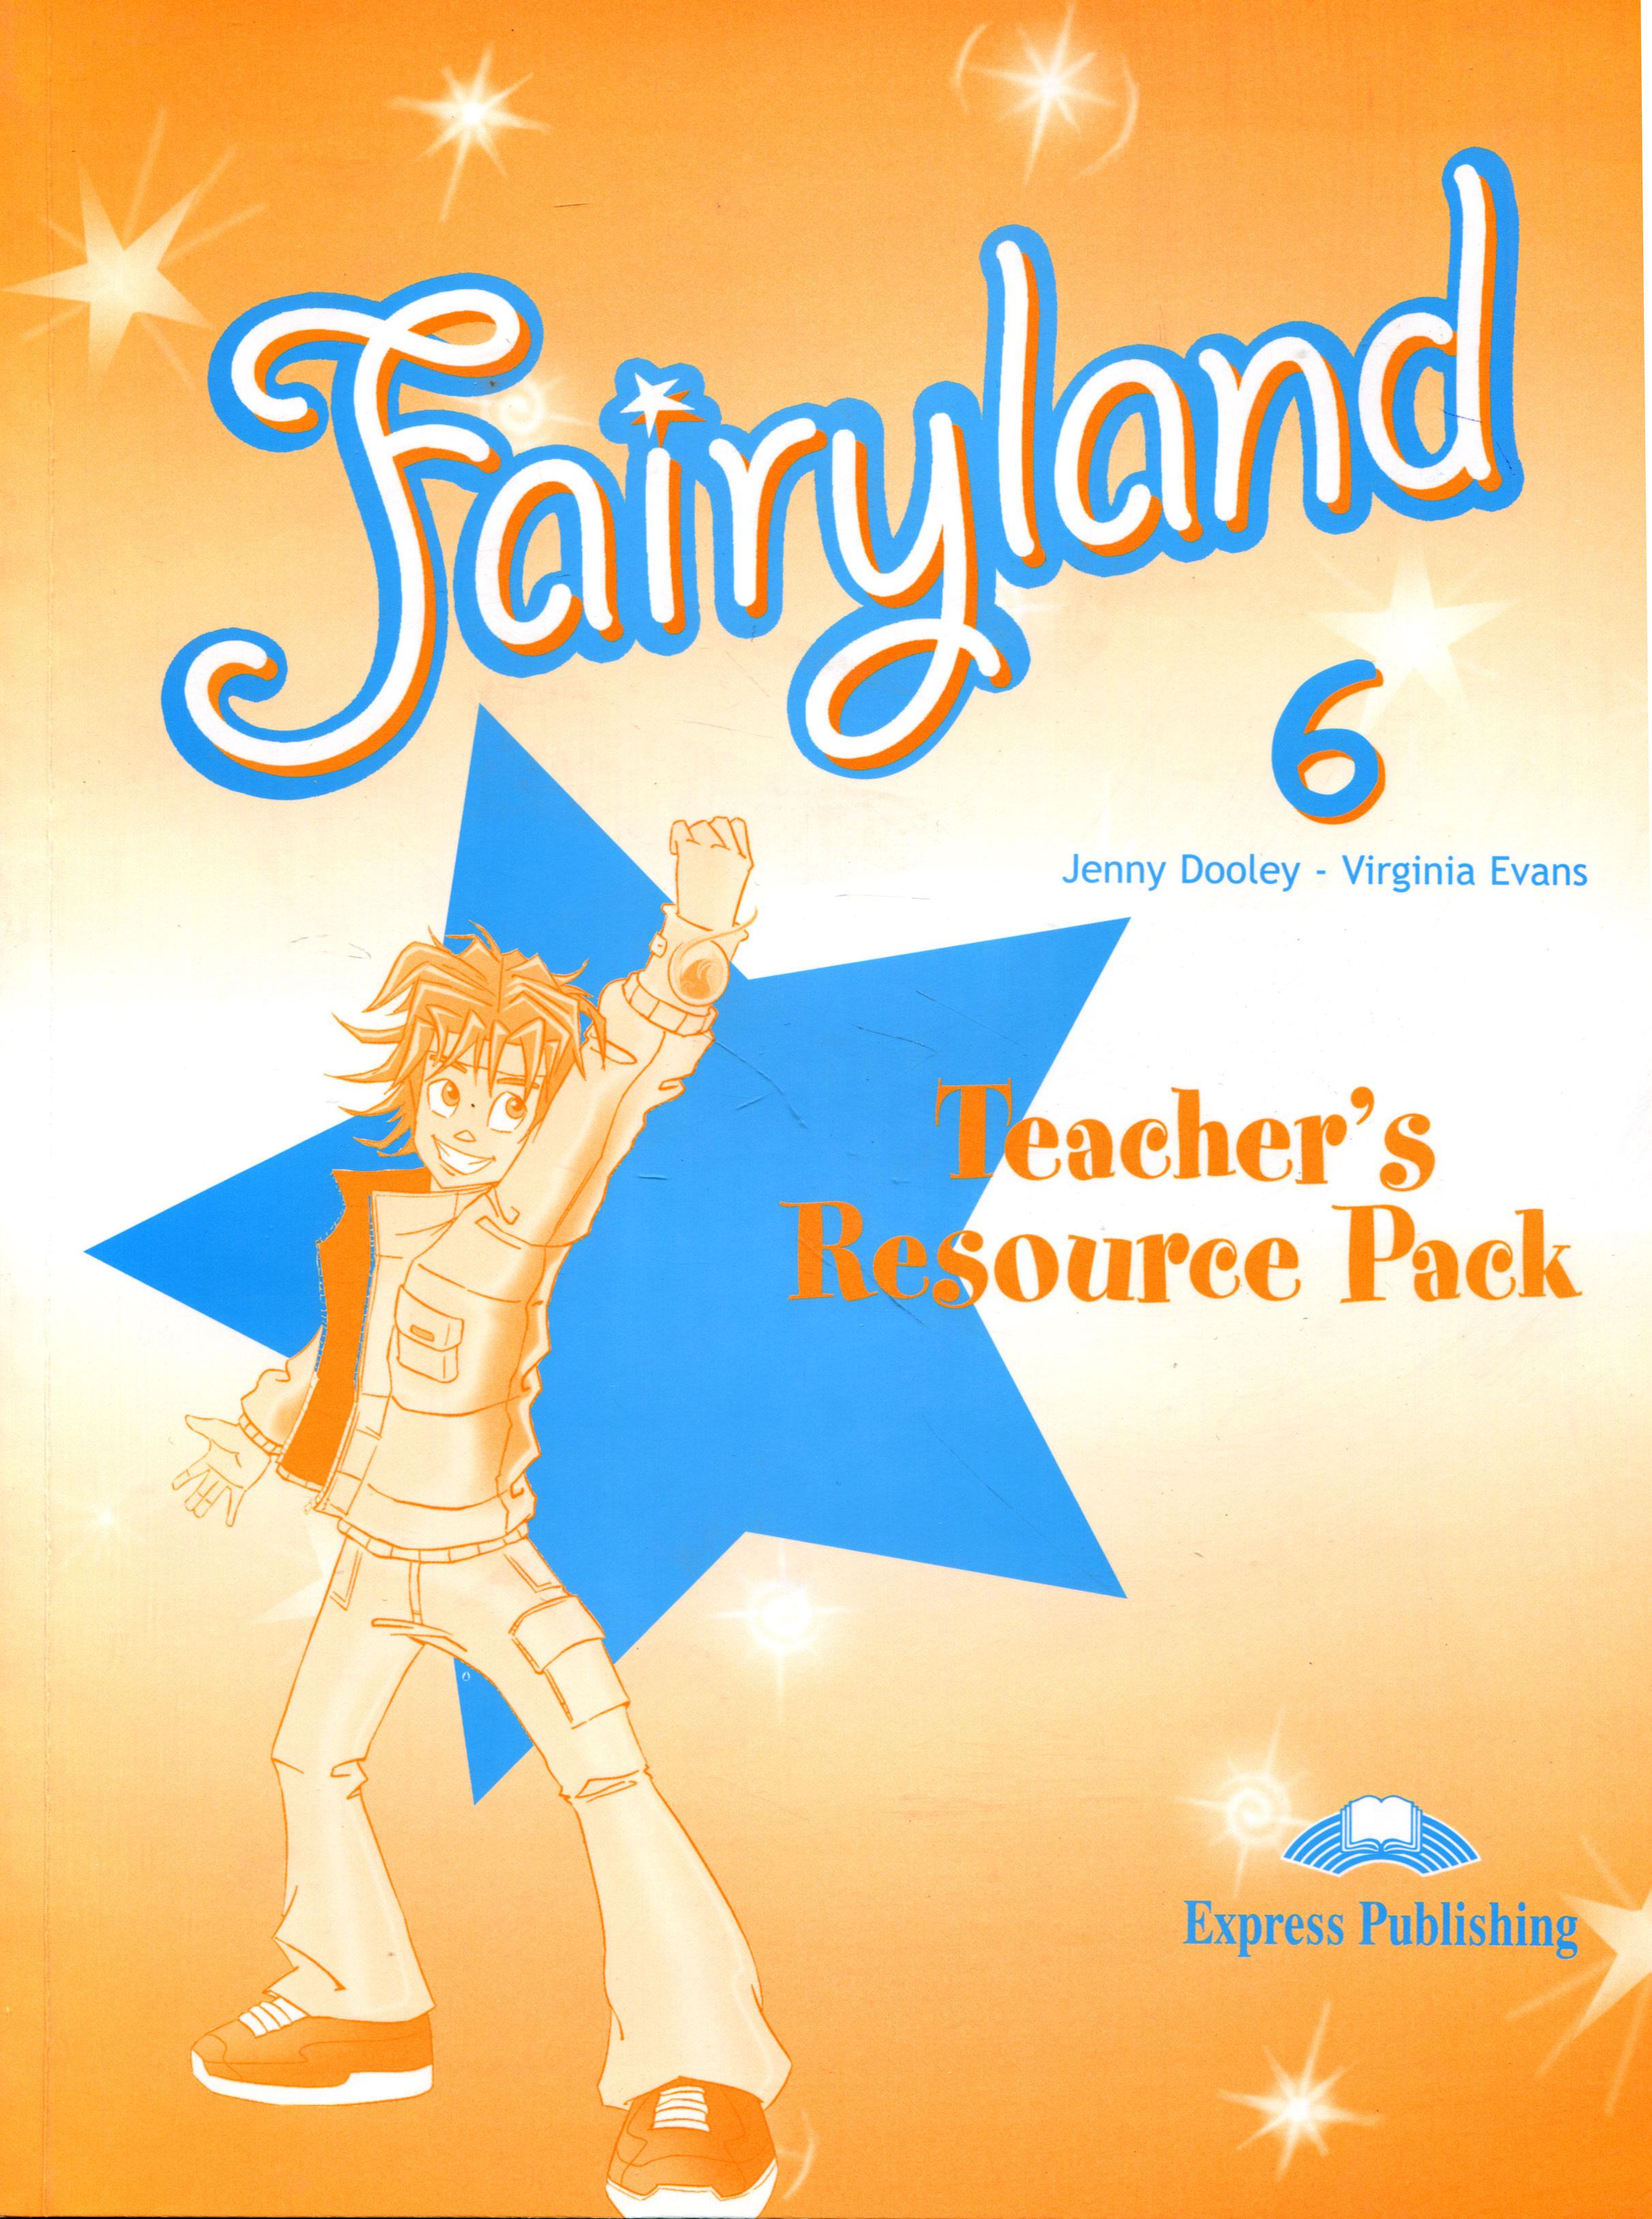 Fairyland 6: Teacher's Resource Pack